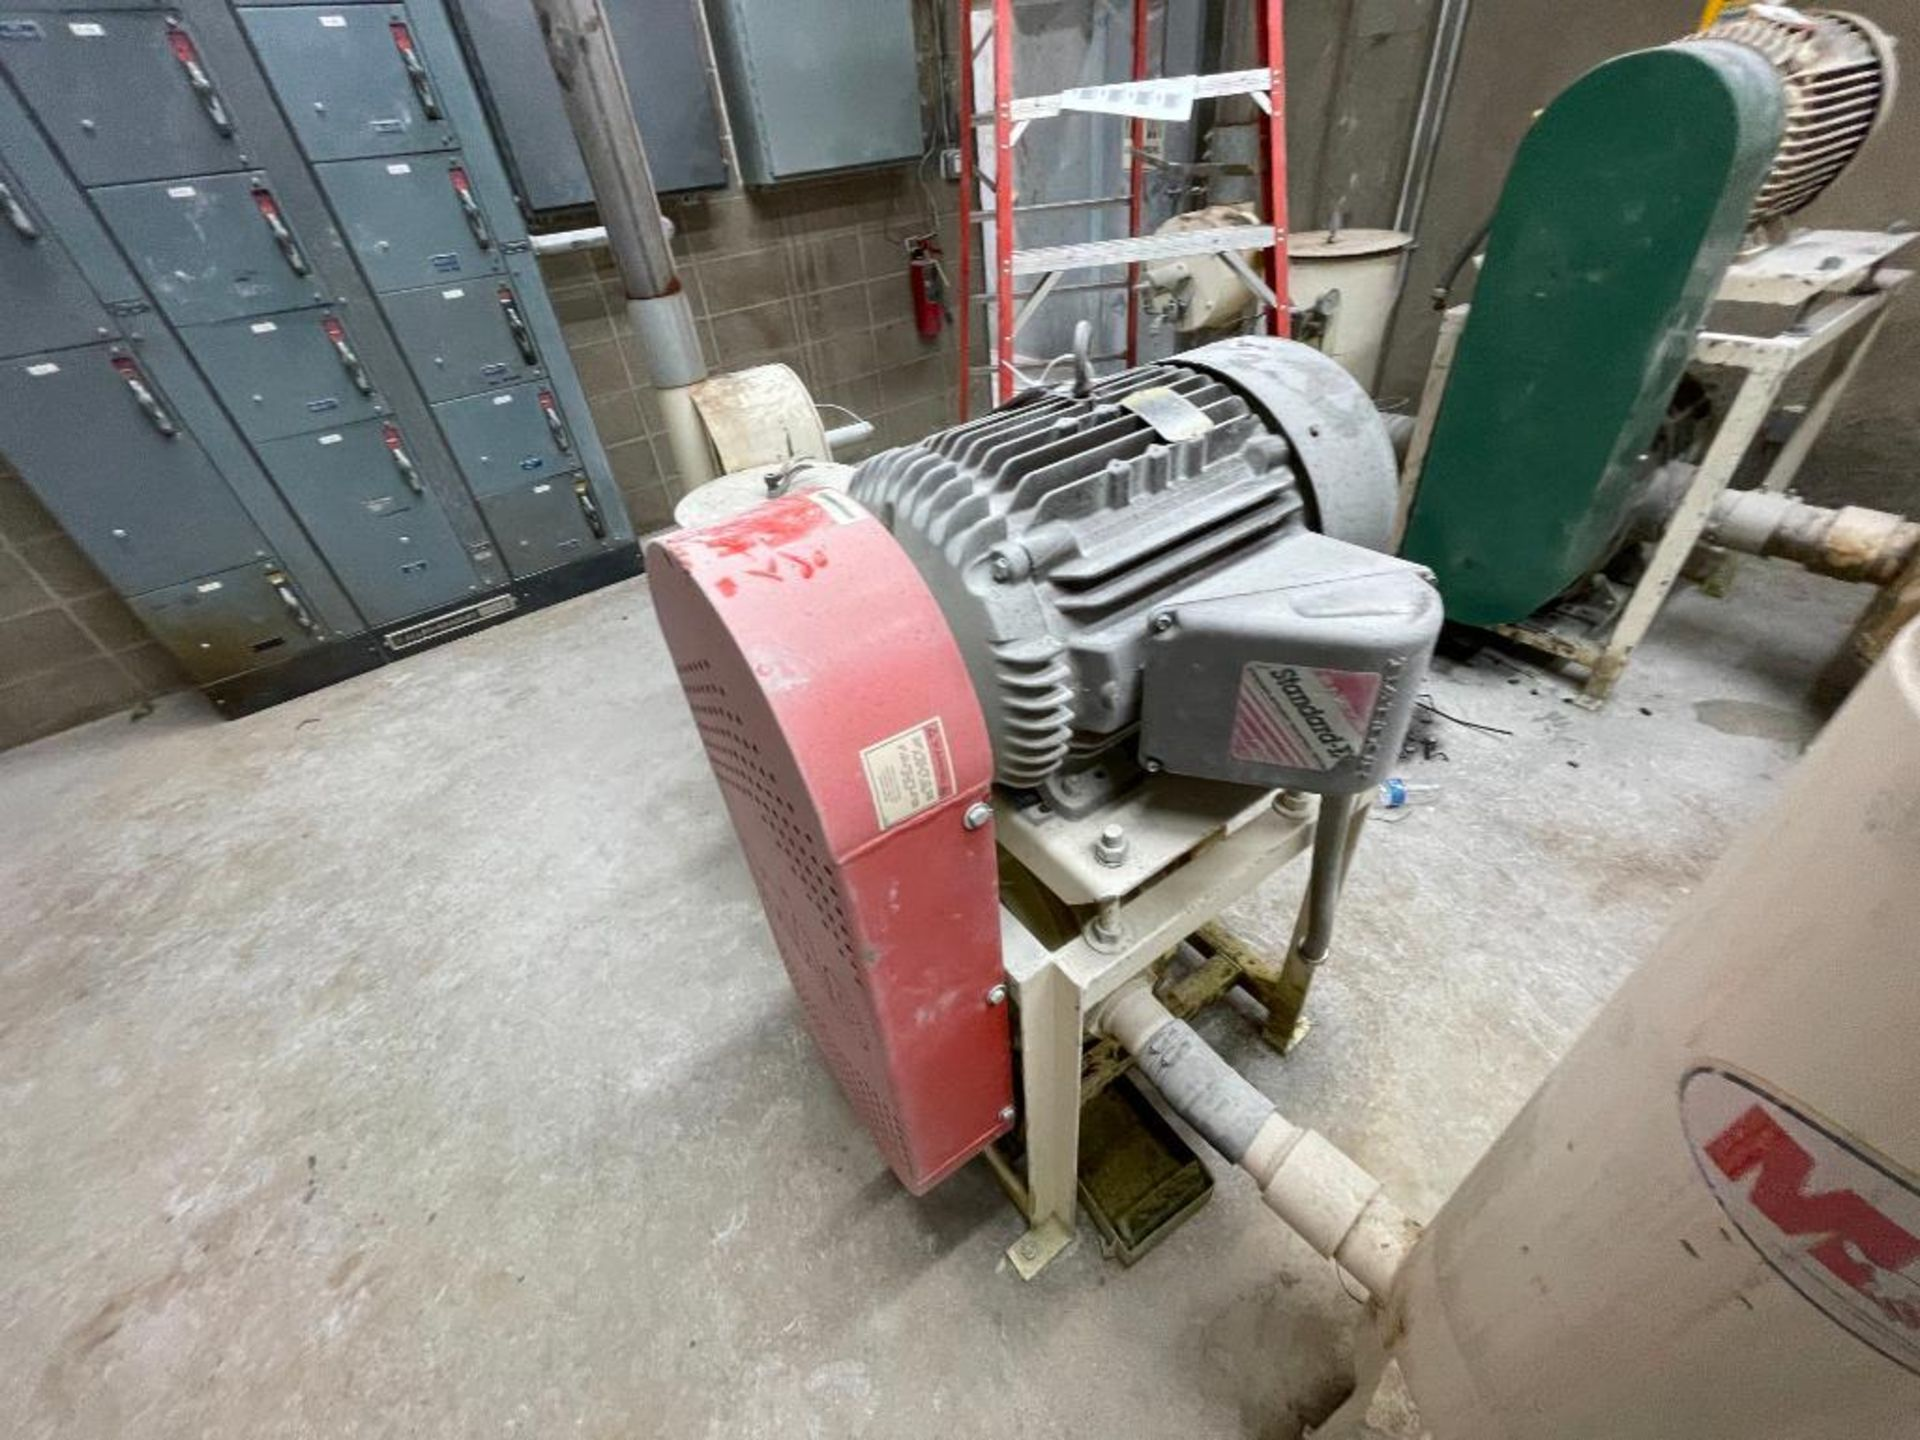 Sutorbilt rotary positive blower - Image 12 of 21